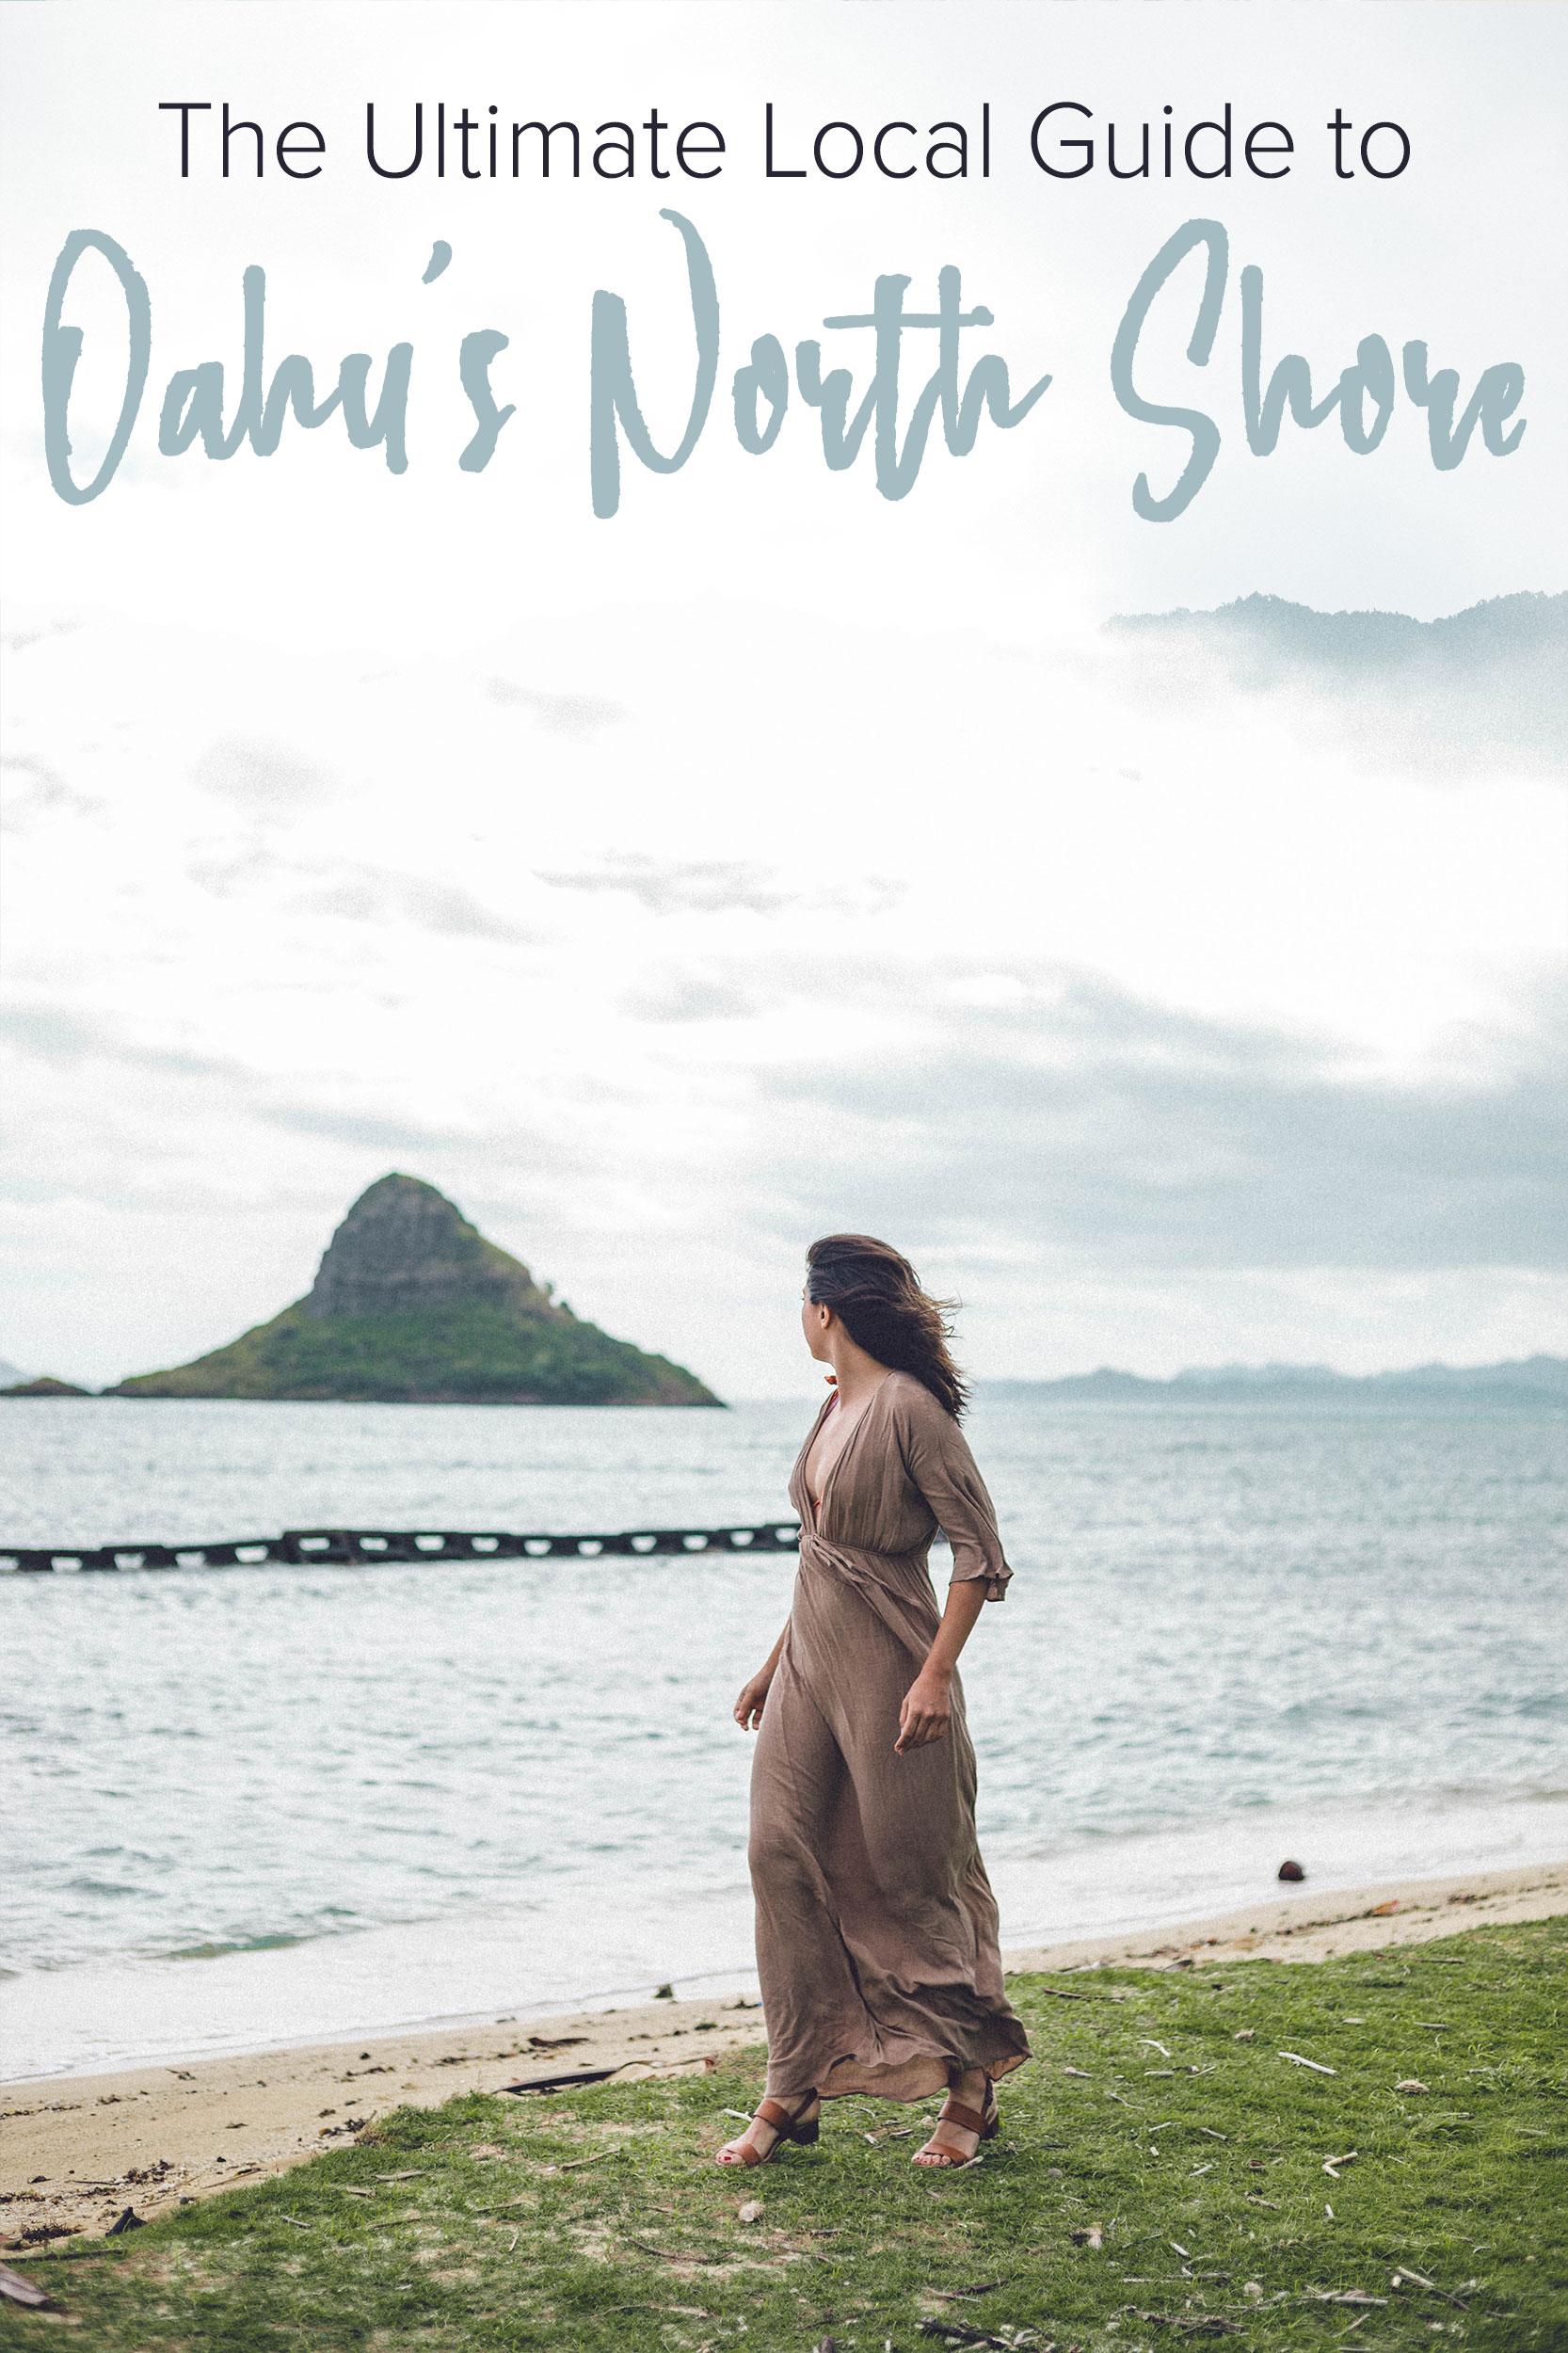 The Ultimate Local Guide to Oahu's North Shore - RachelOffDuty.com